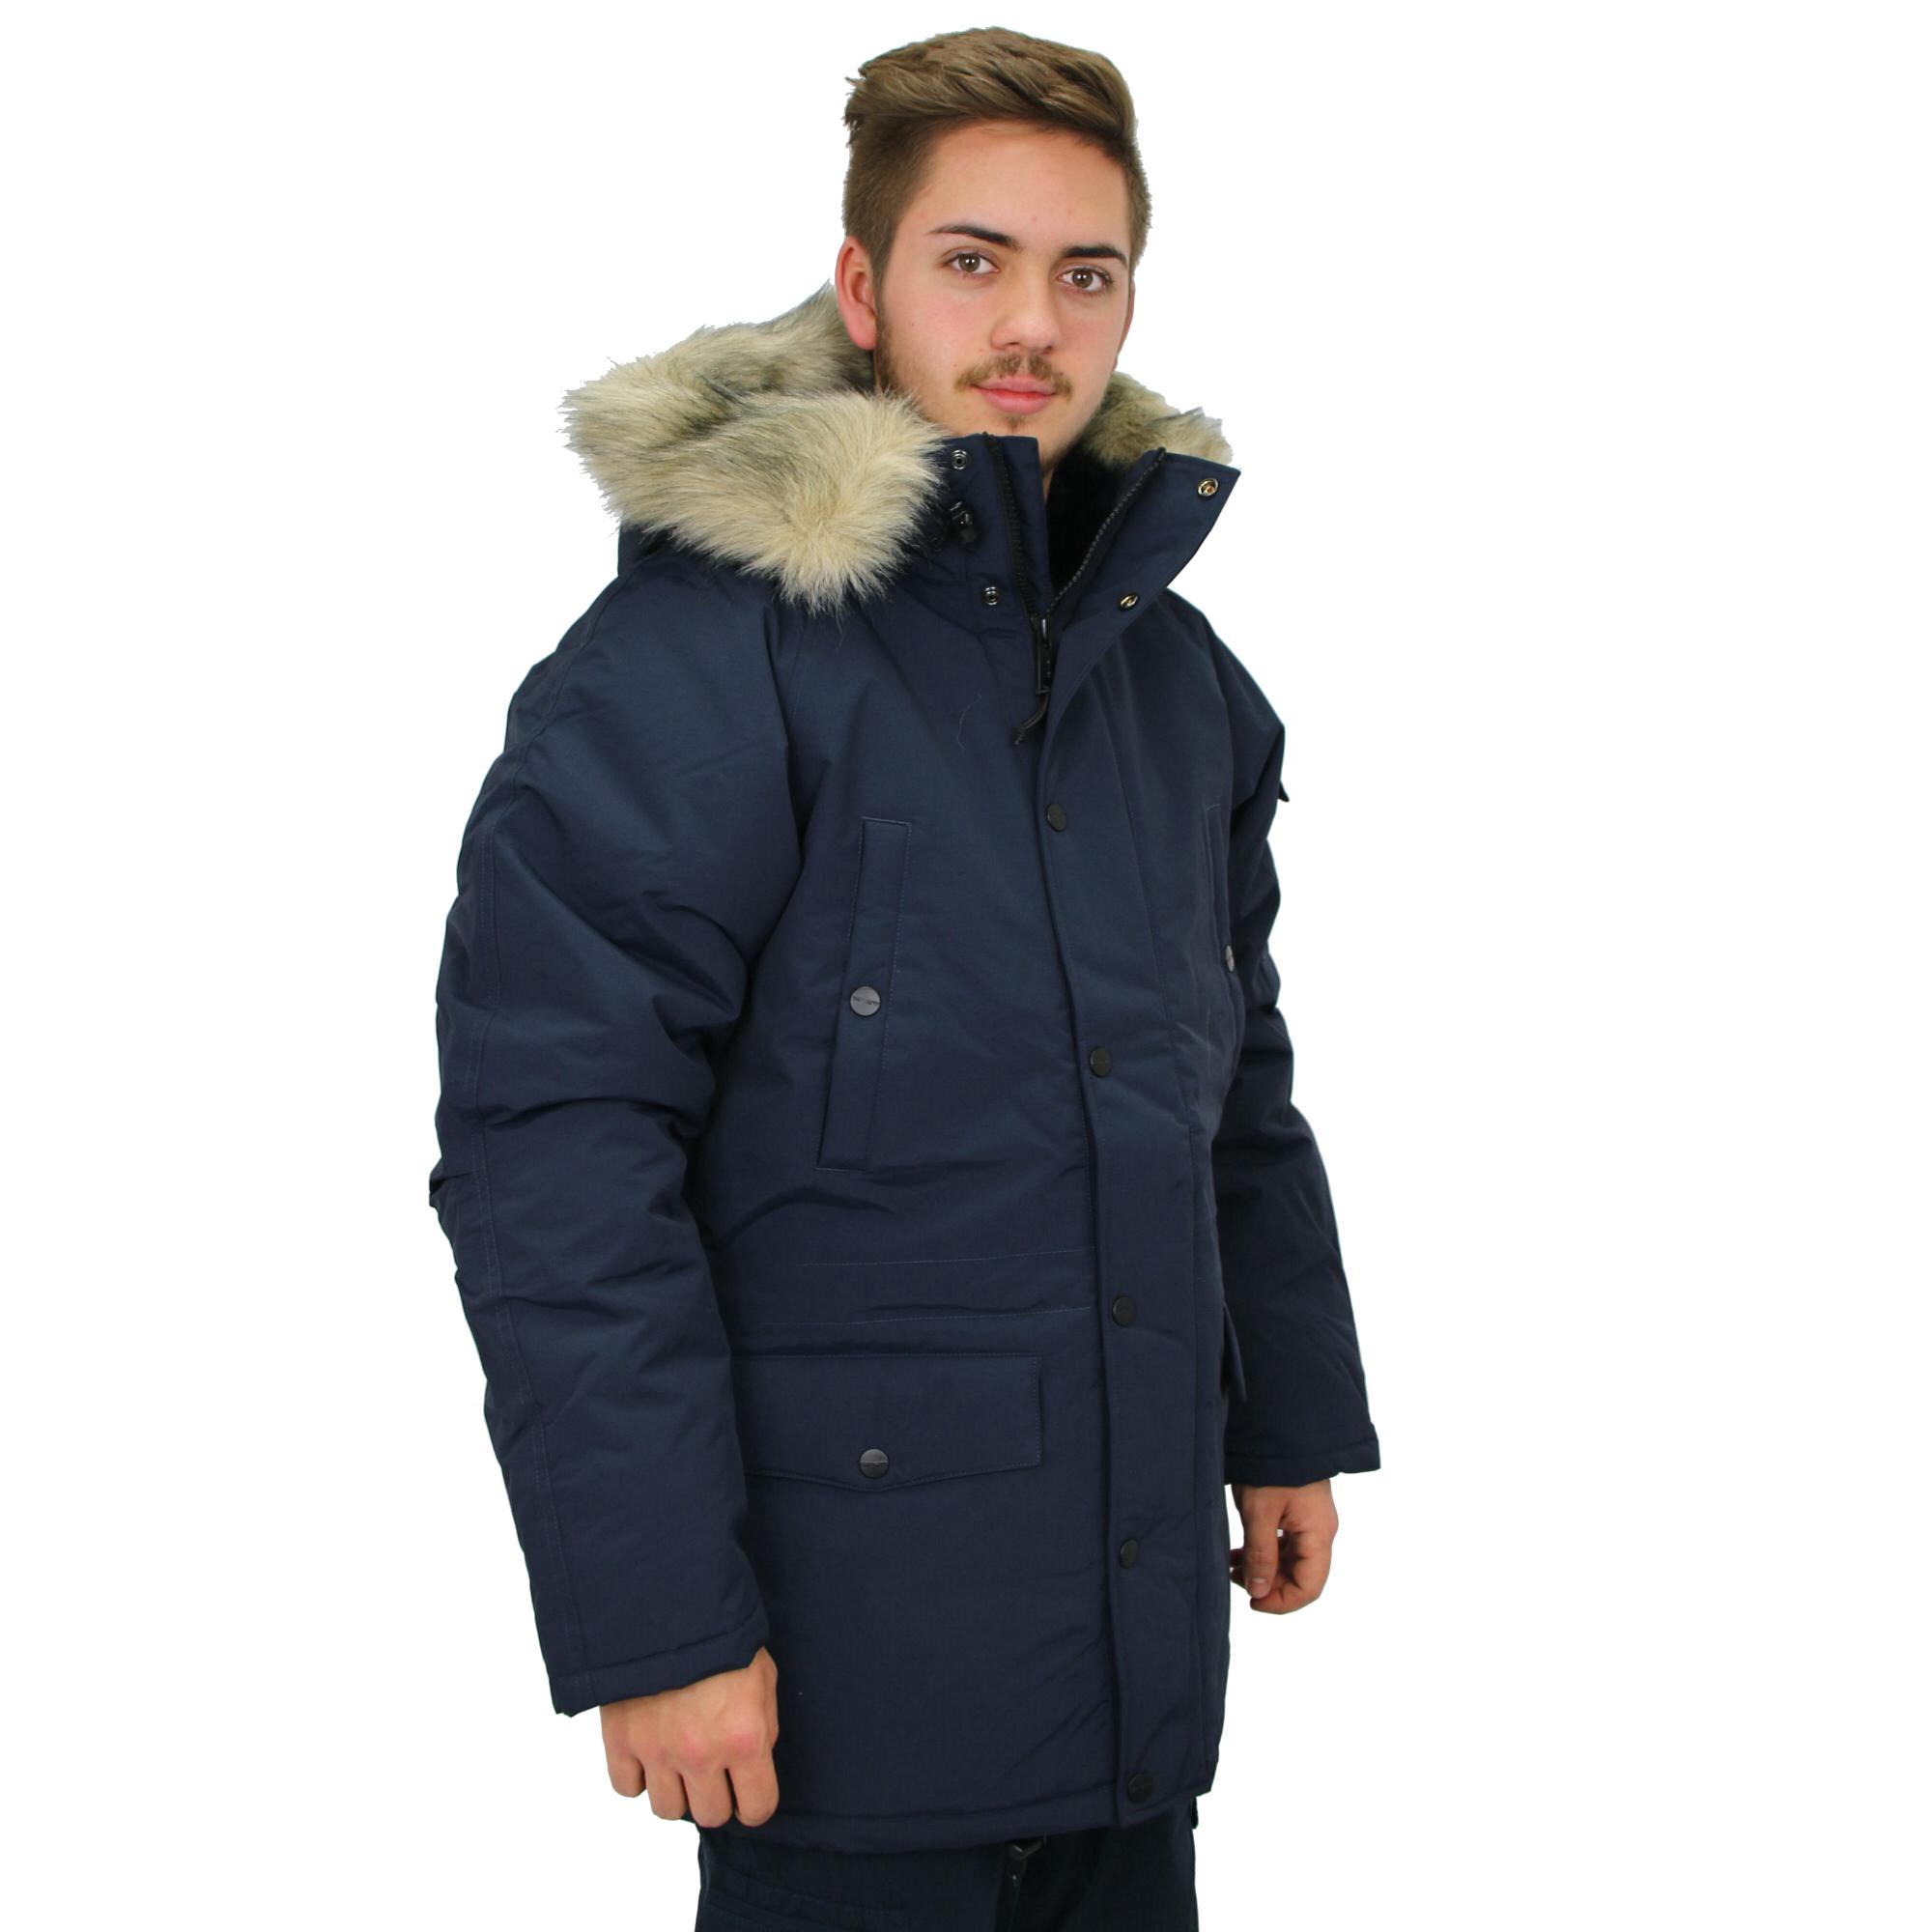 Carhartt Anchorage Parka Jacket Winter Jacket Winter Coat